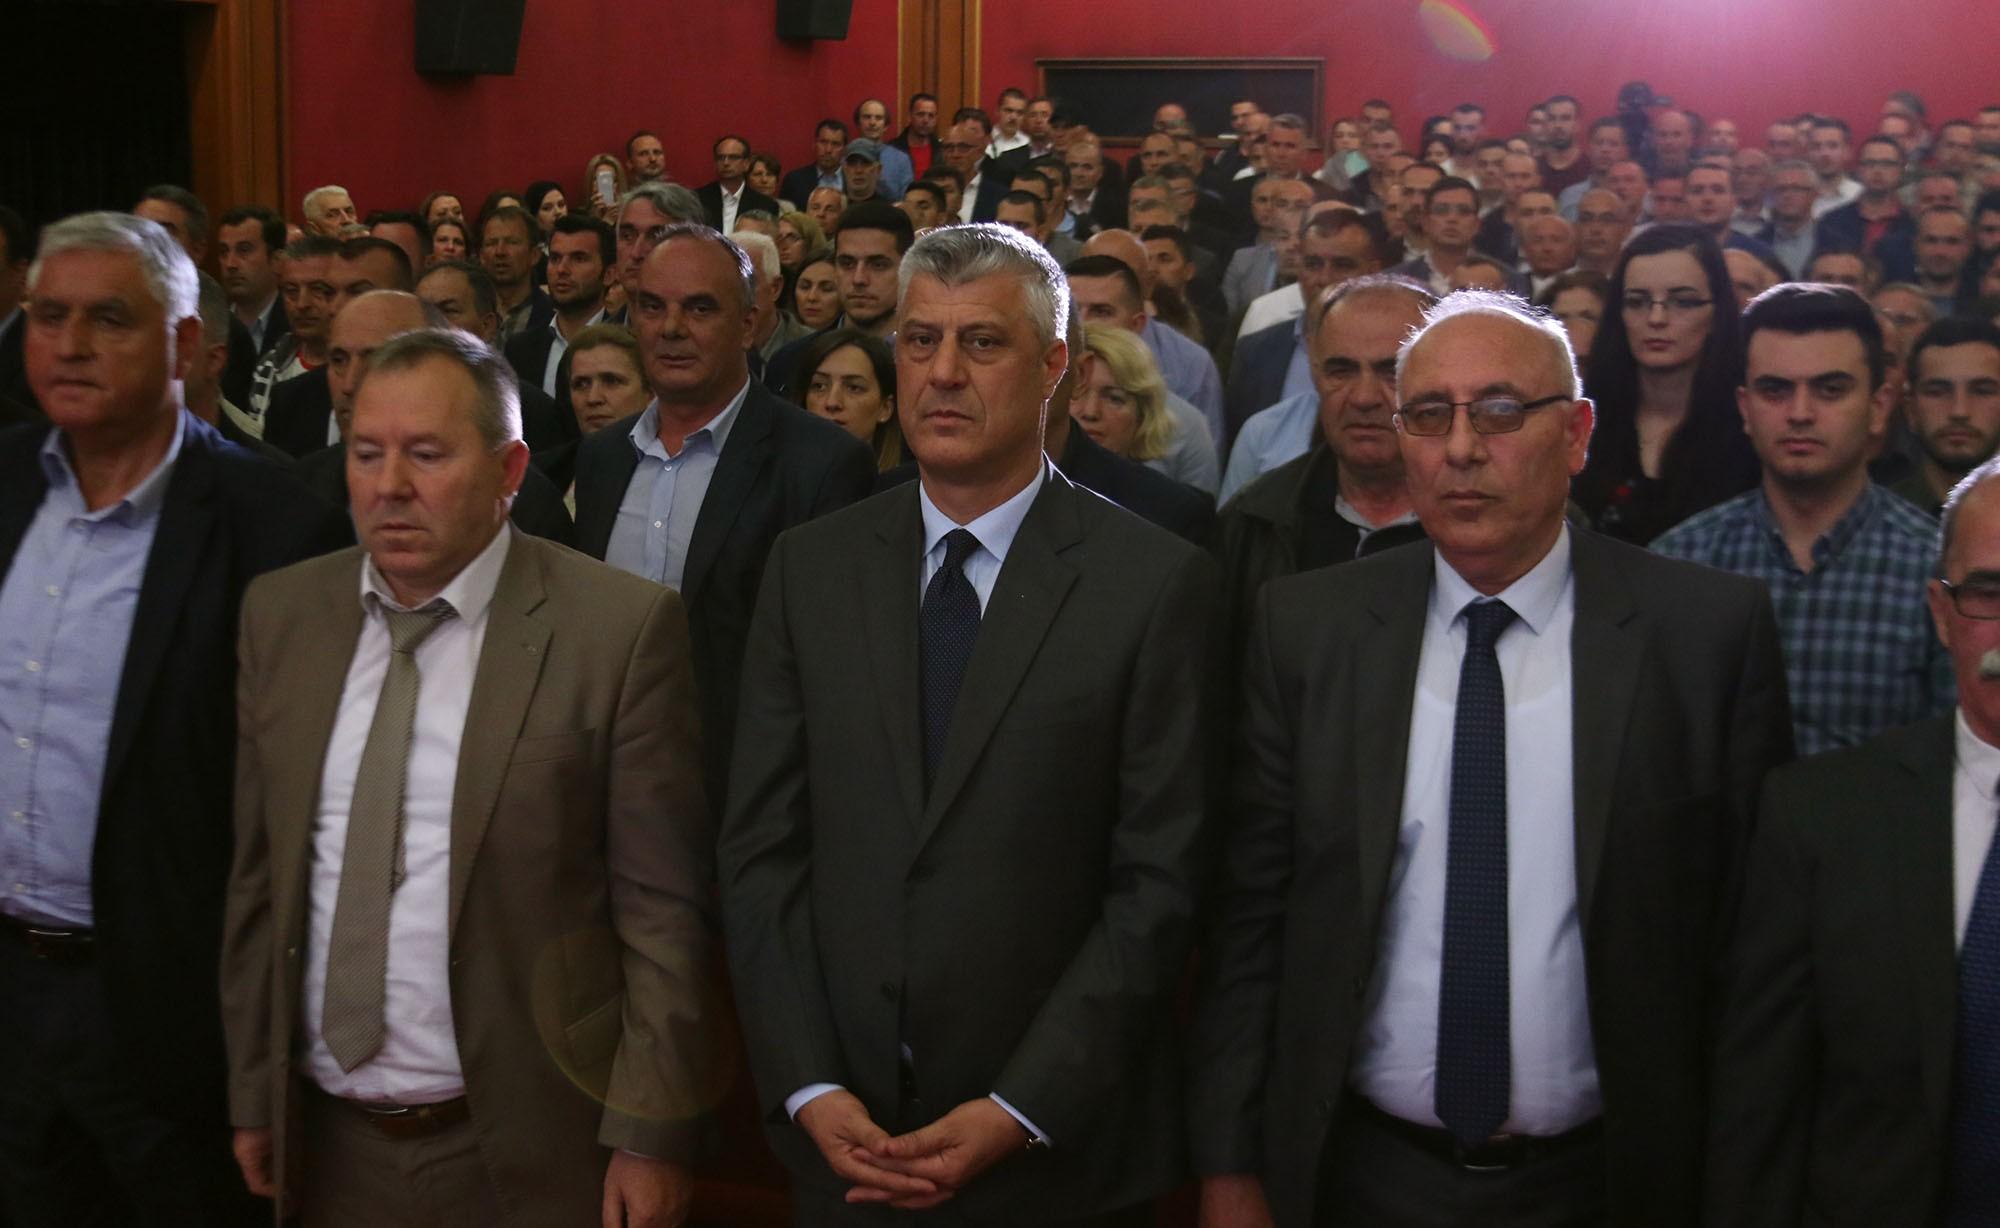 Predsednik Thaçi: Bahri Fazliu i Agron Rrahmani, svetle figure nacionalnog pokreta